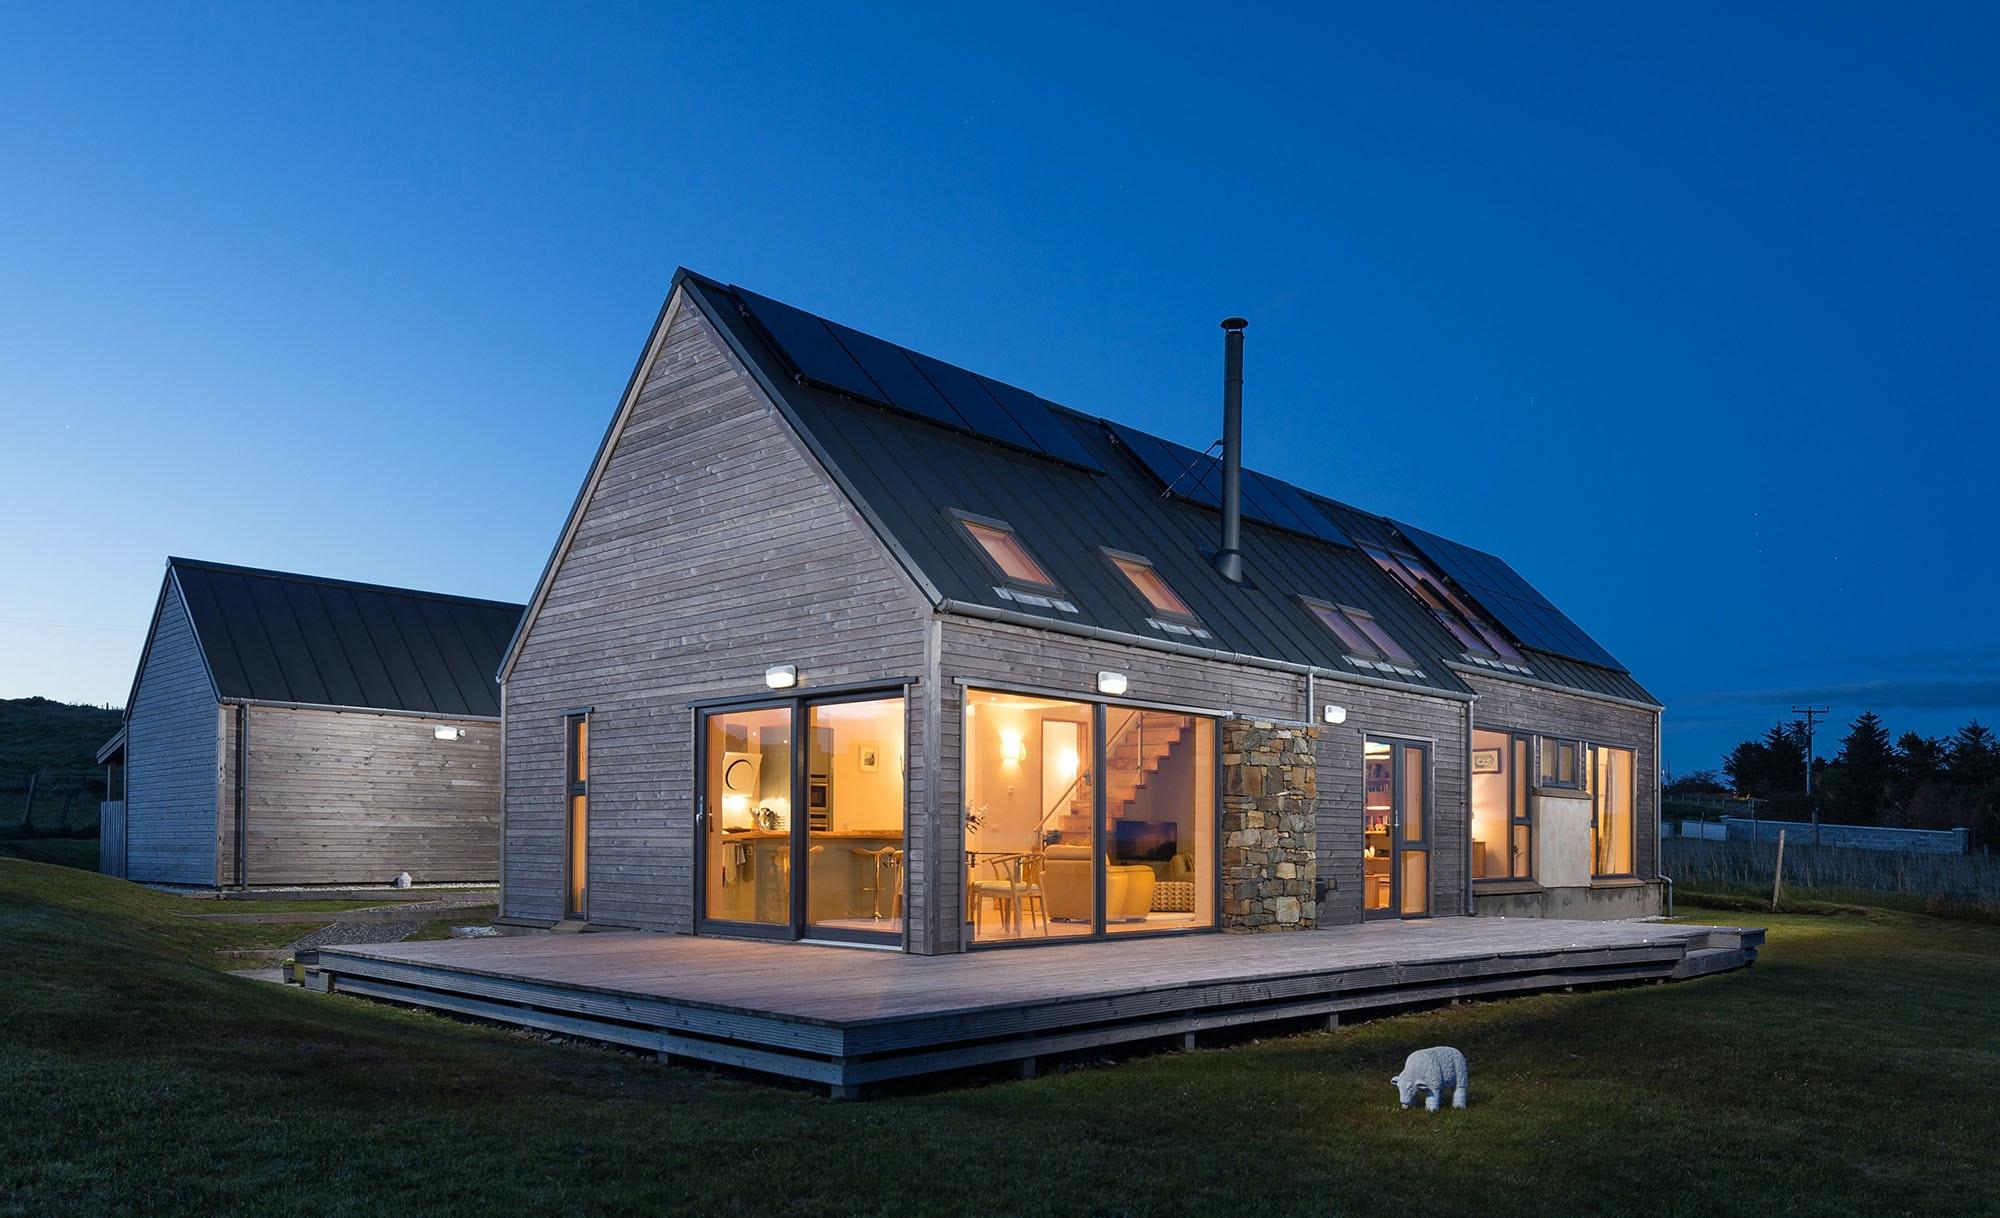 Lewis Longhouse Luxury Home On The Beautiful Scottish